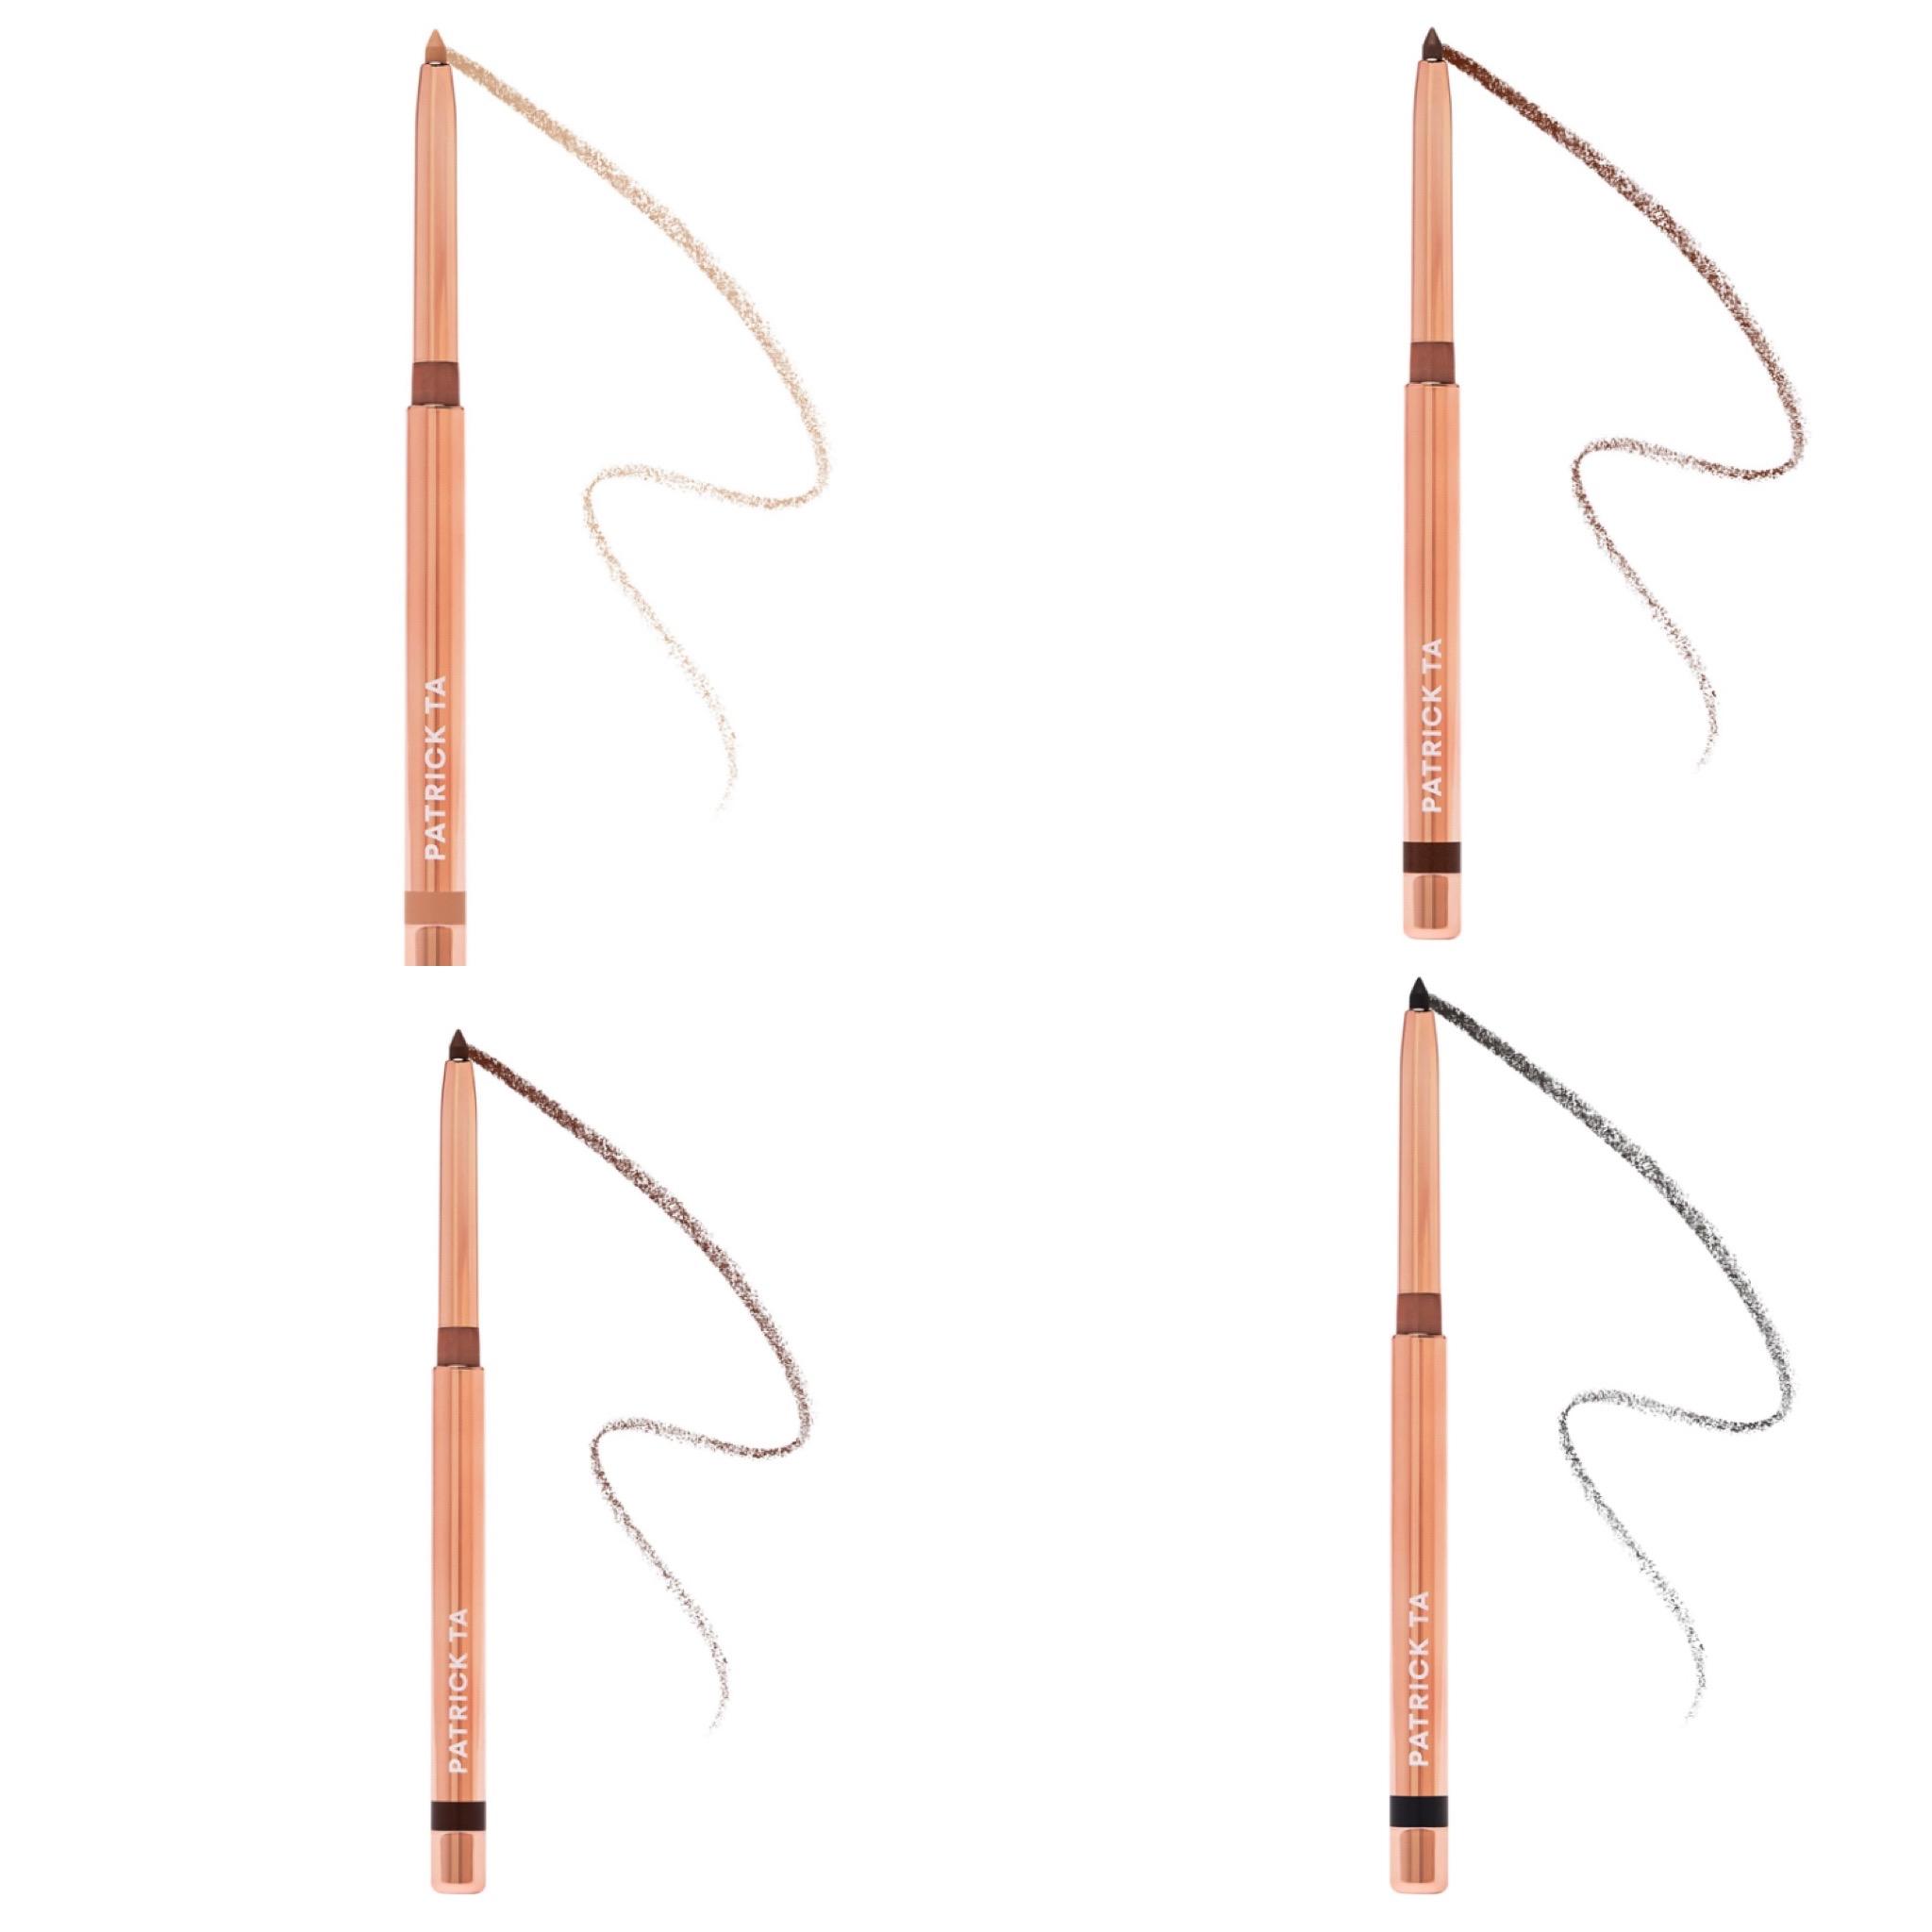 Patrick Ta Major Dimension Precision Gel Eyeliners